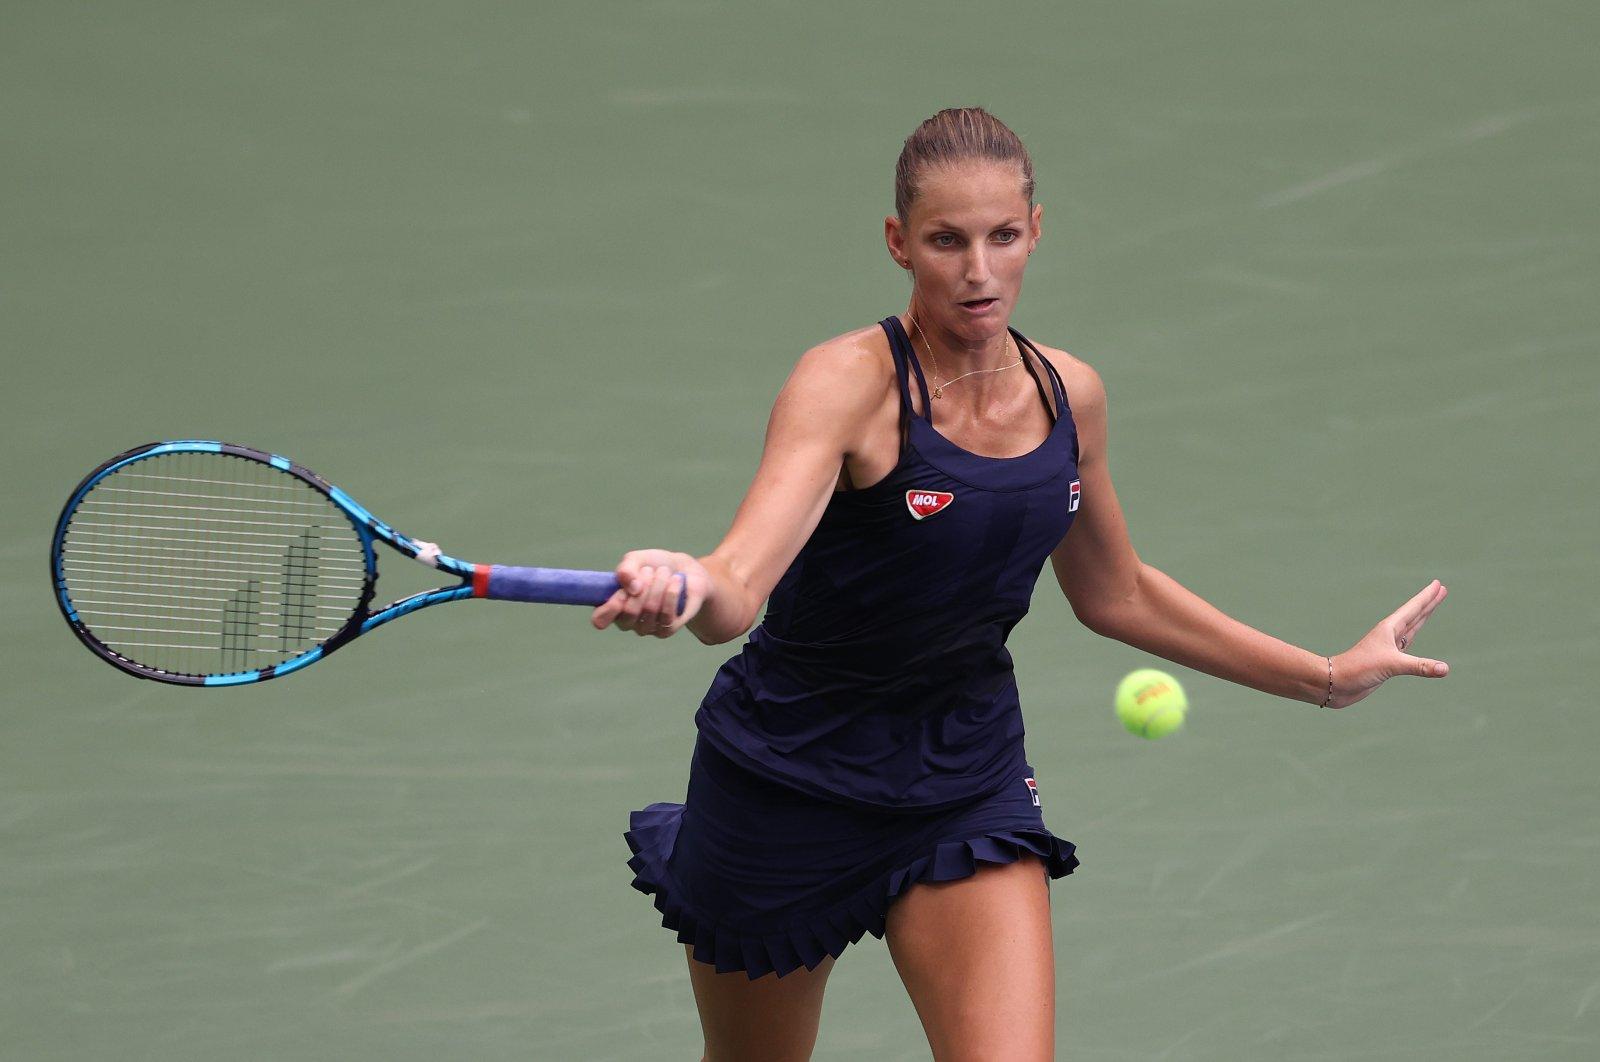 Karolina Pliskova returns the ball to Caroline Garcia during the second-round match of U.S. Open tennis tournament in New York, U.S., Sept. 2, 2020. (AFP Photo)